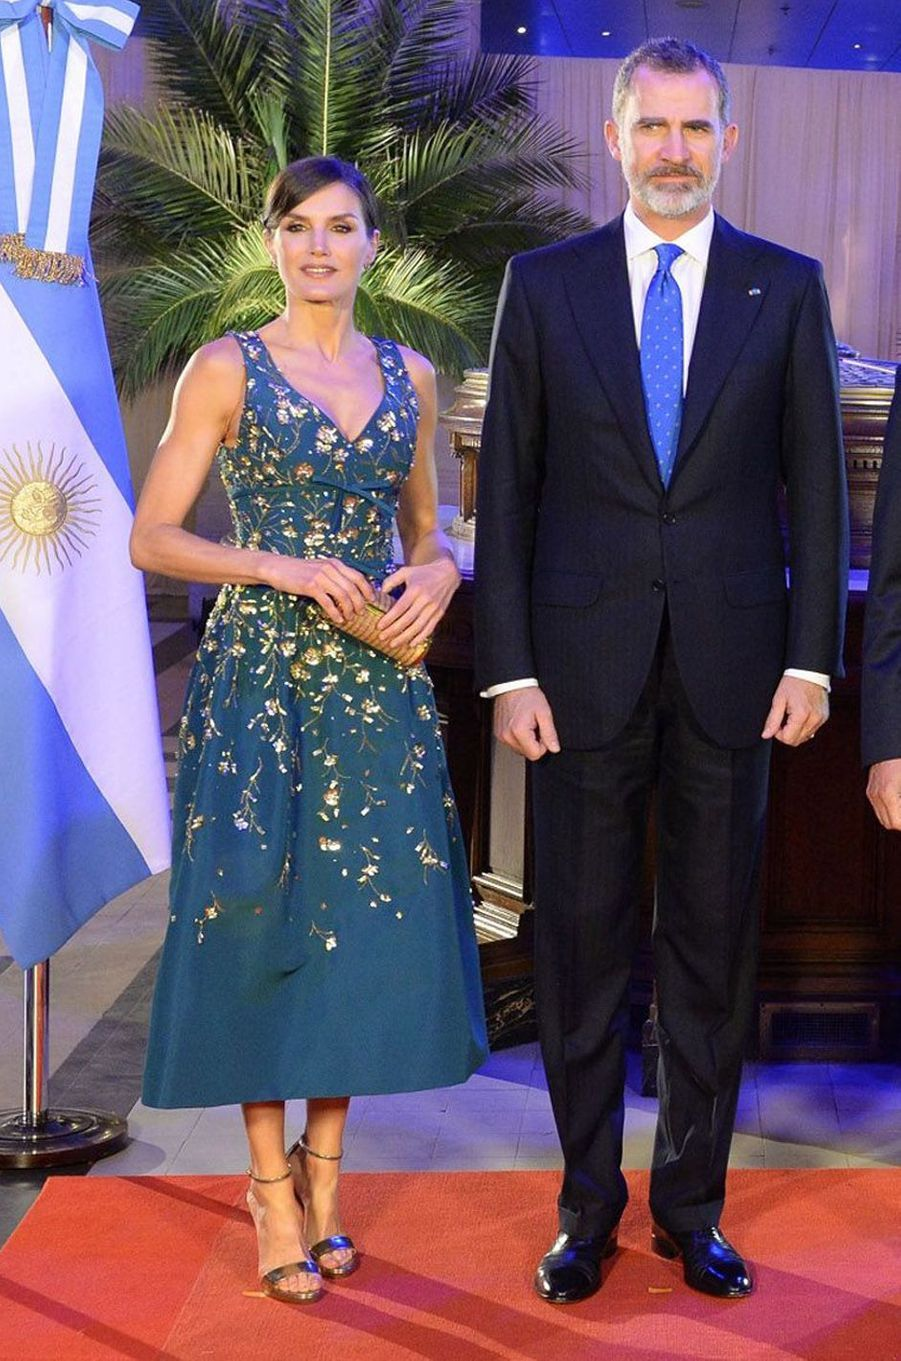 La reine Letizia d'Espagne dans une robe Carolina Herrera à Buenos Aires, le 26 mars 2019